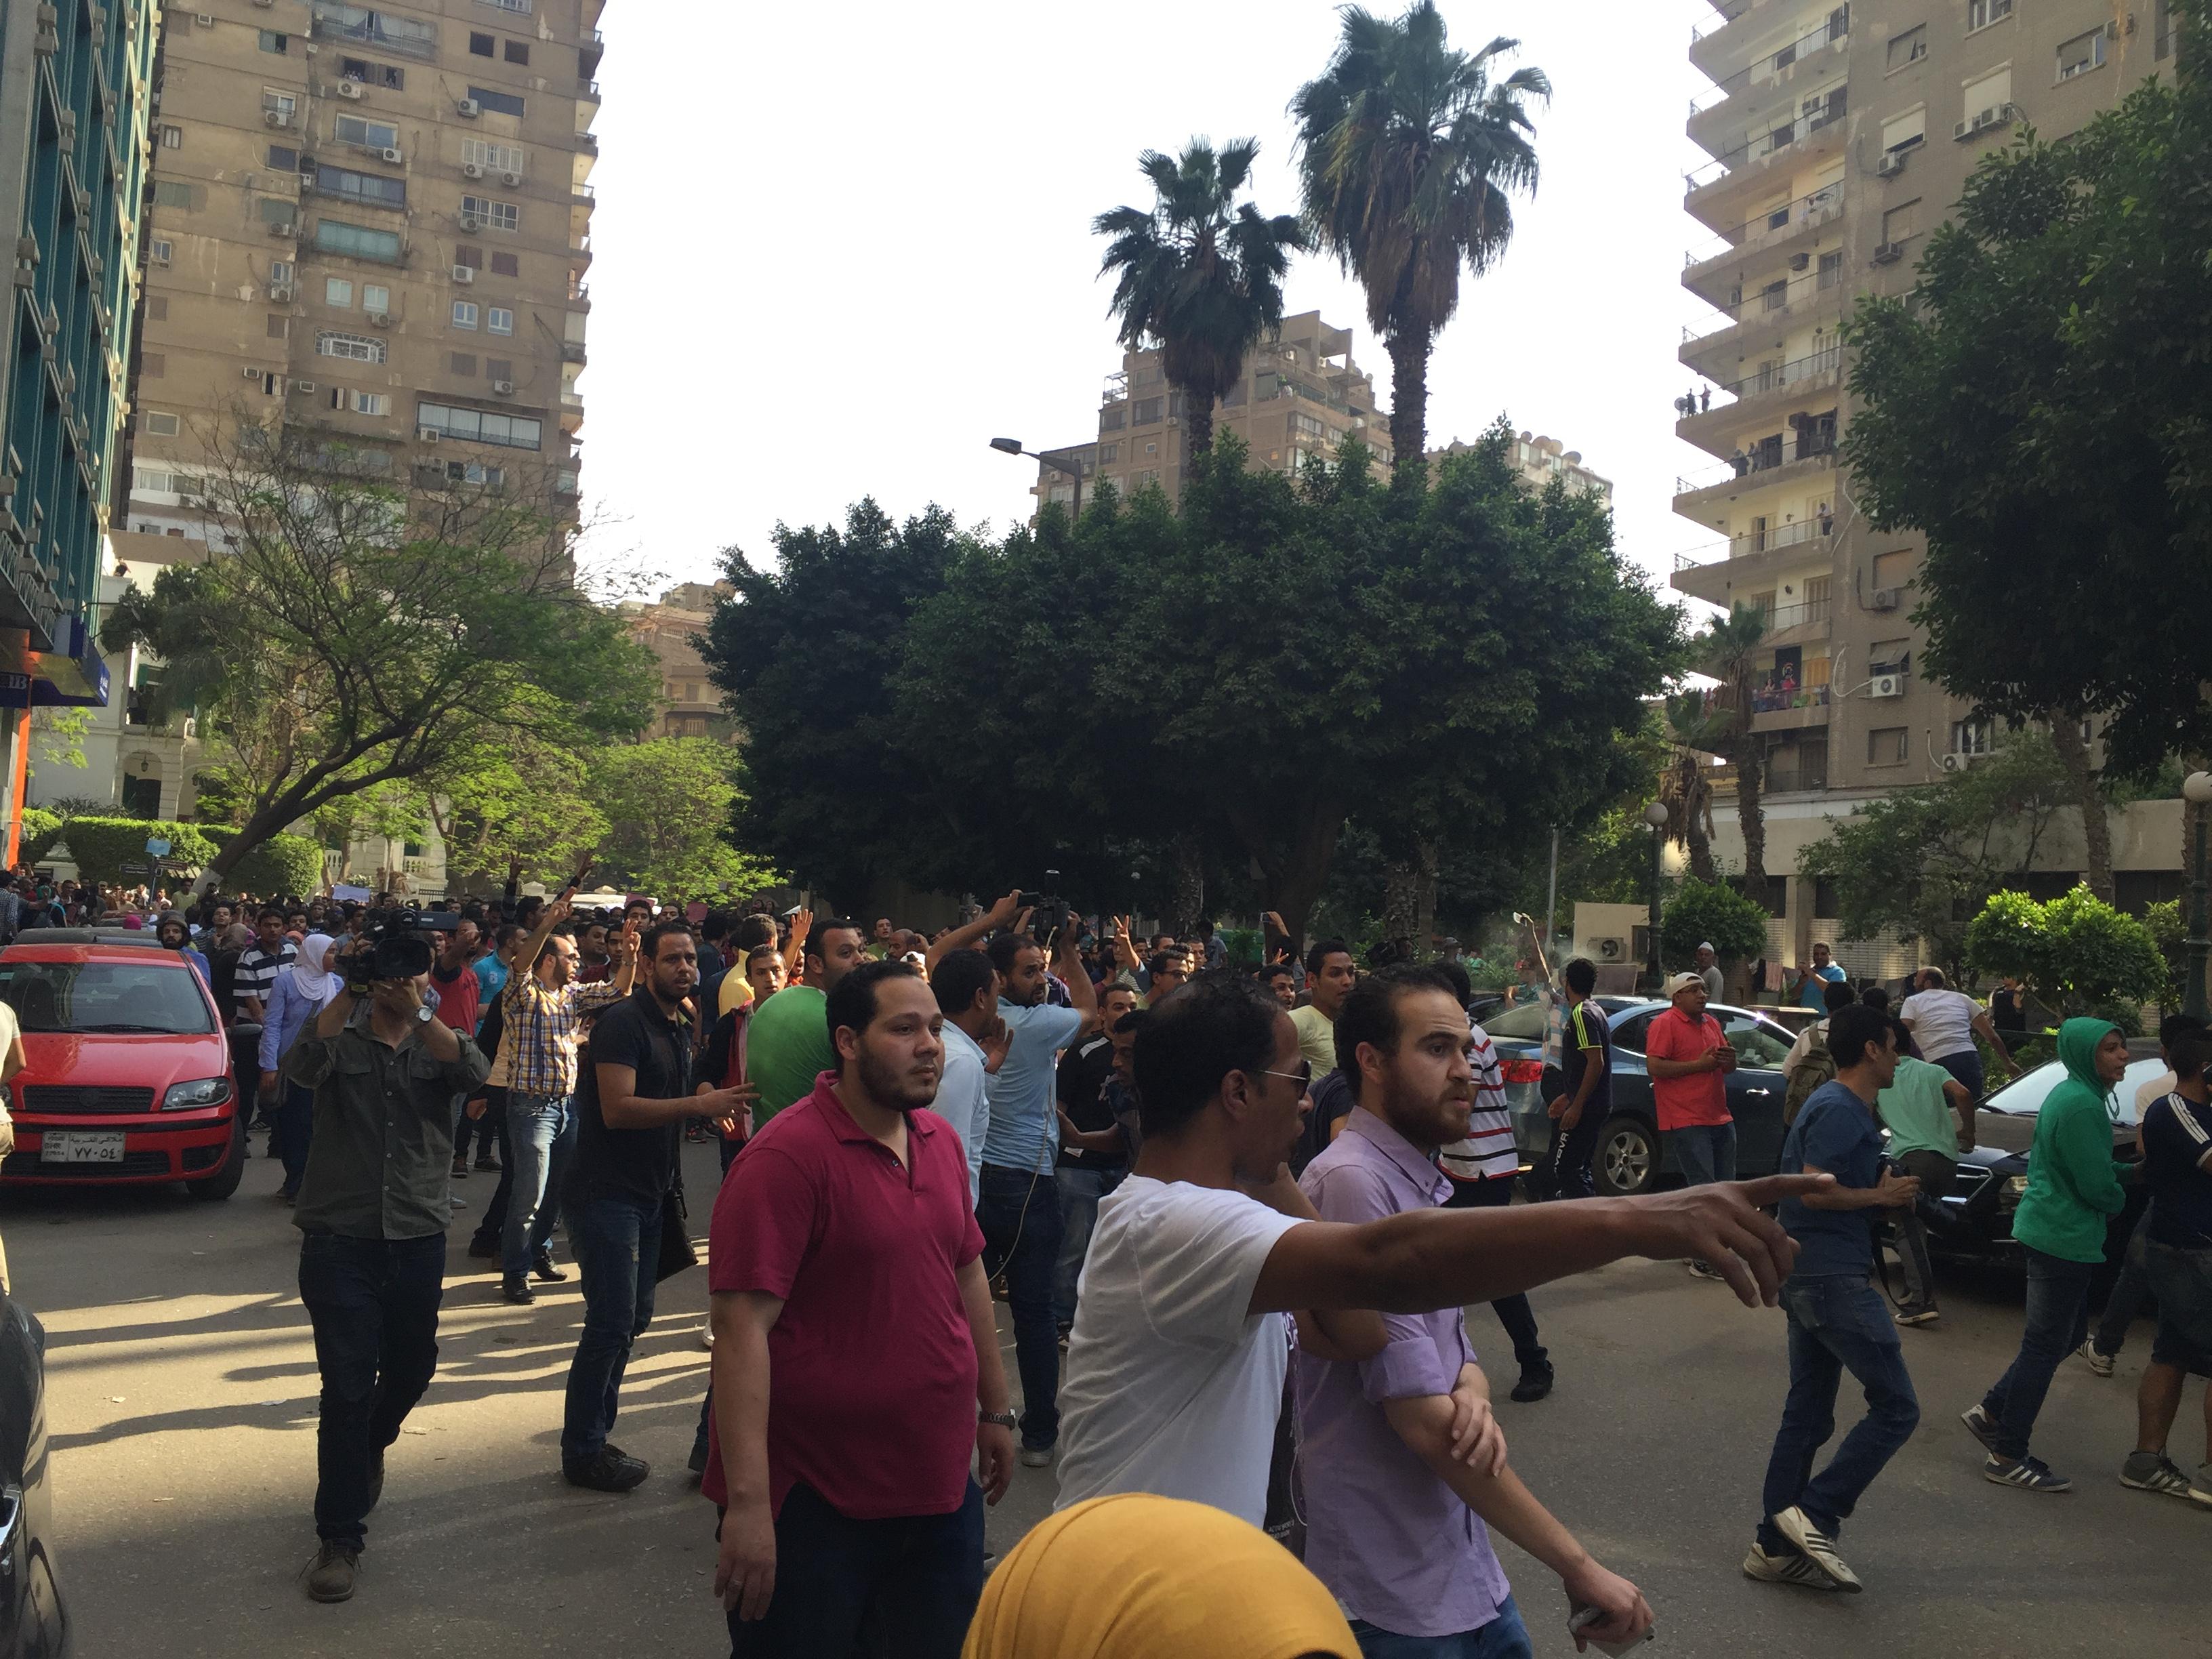 Demonstrators on 25 April. Photo: Salma El Saeed